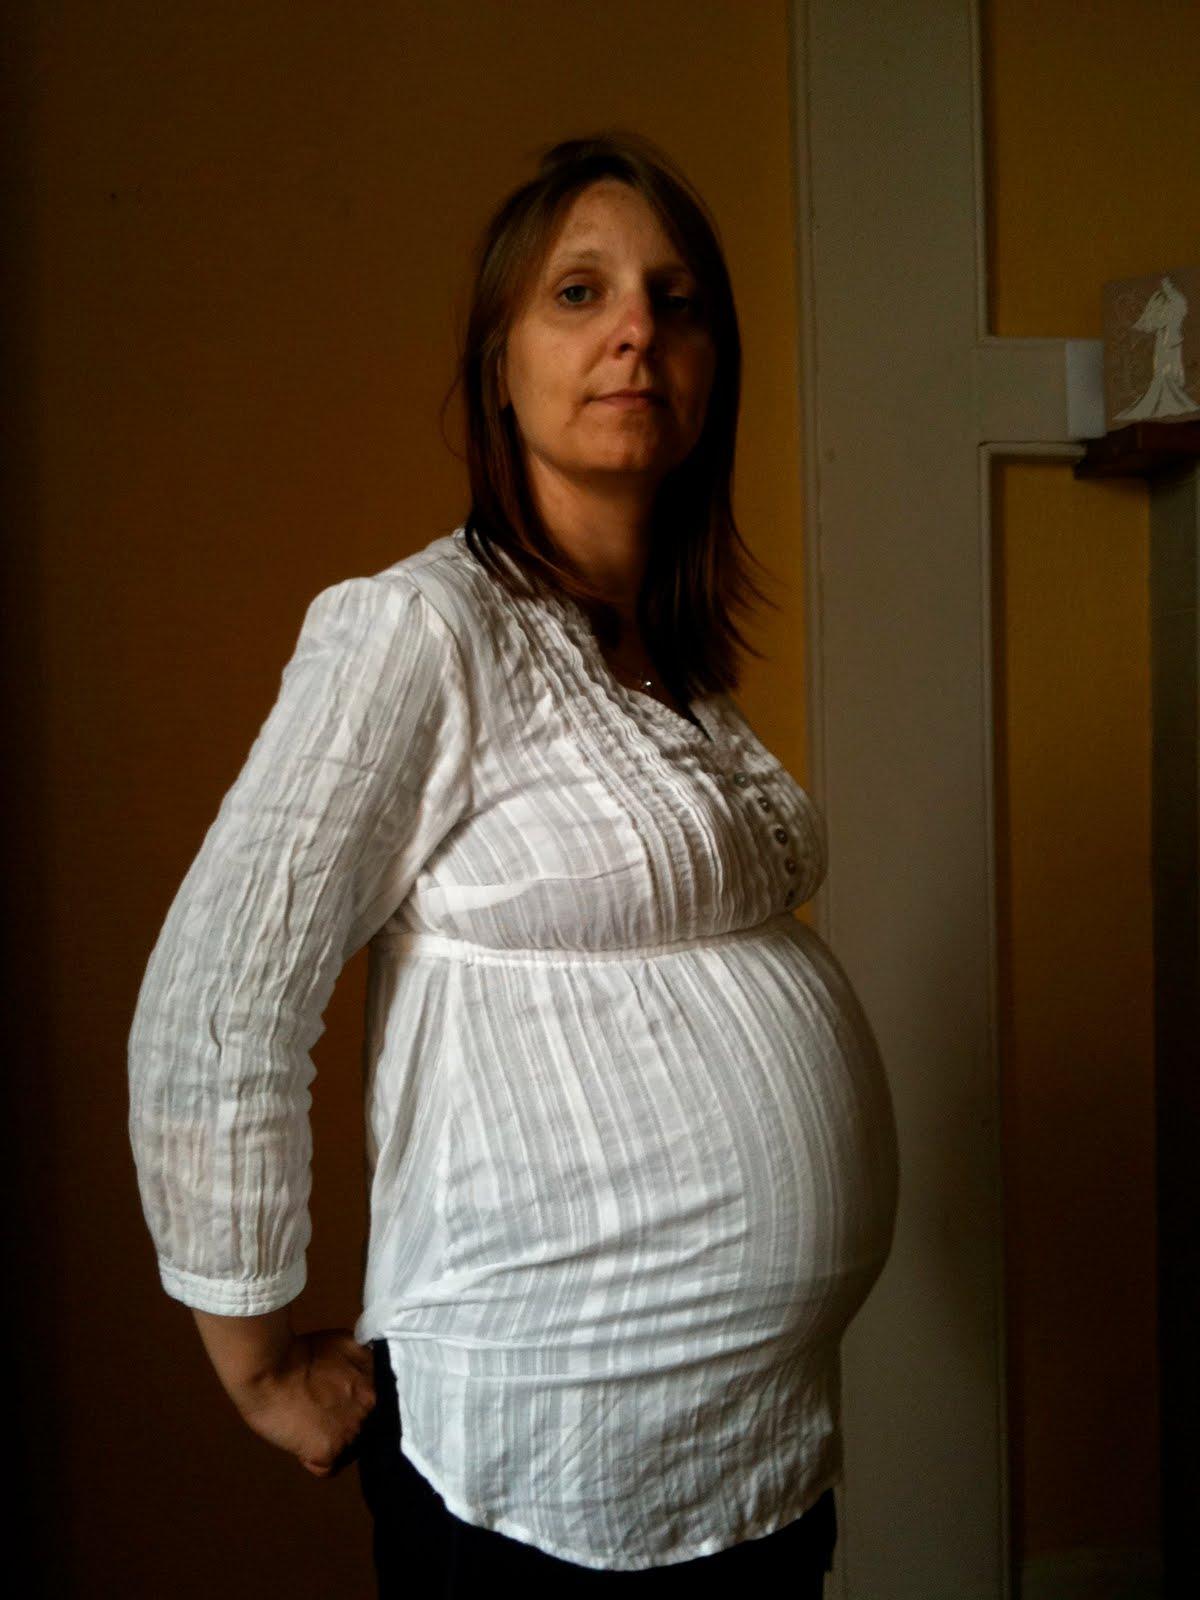 Pregnant Susen Rabold